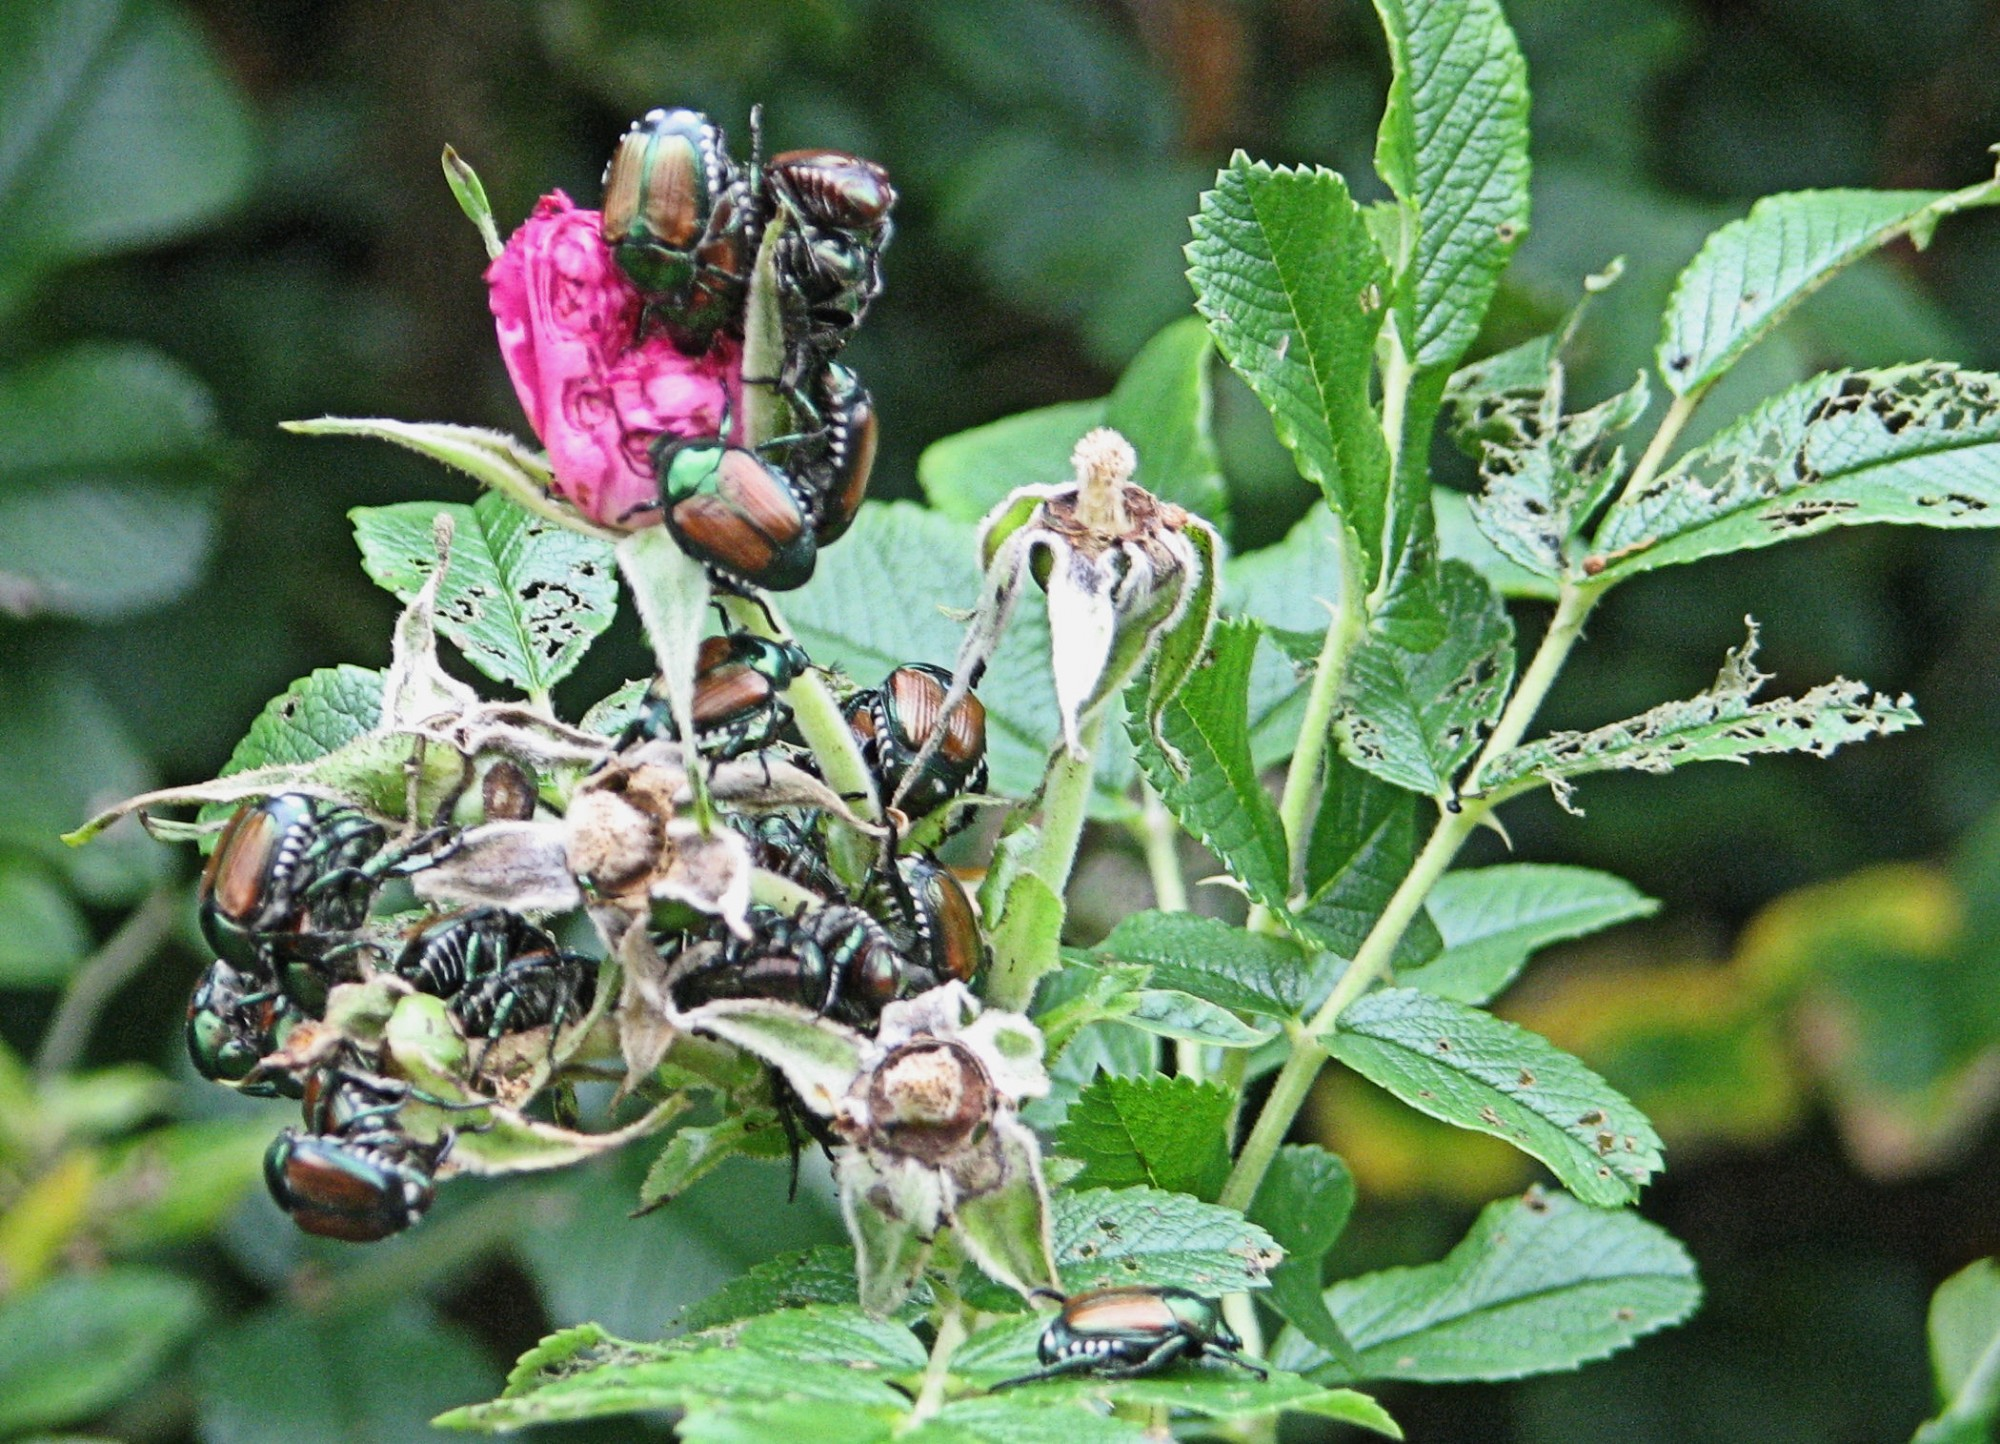 Japanese_Beetles_on_Pasture_Rose,_Ottawa